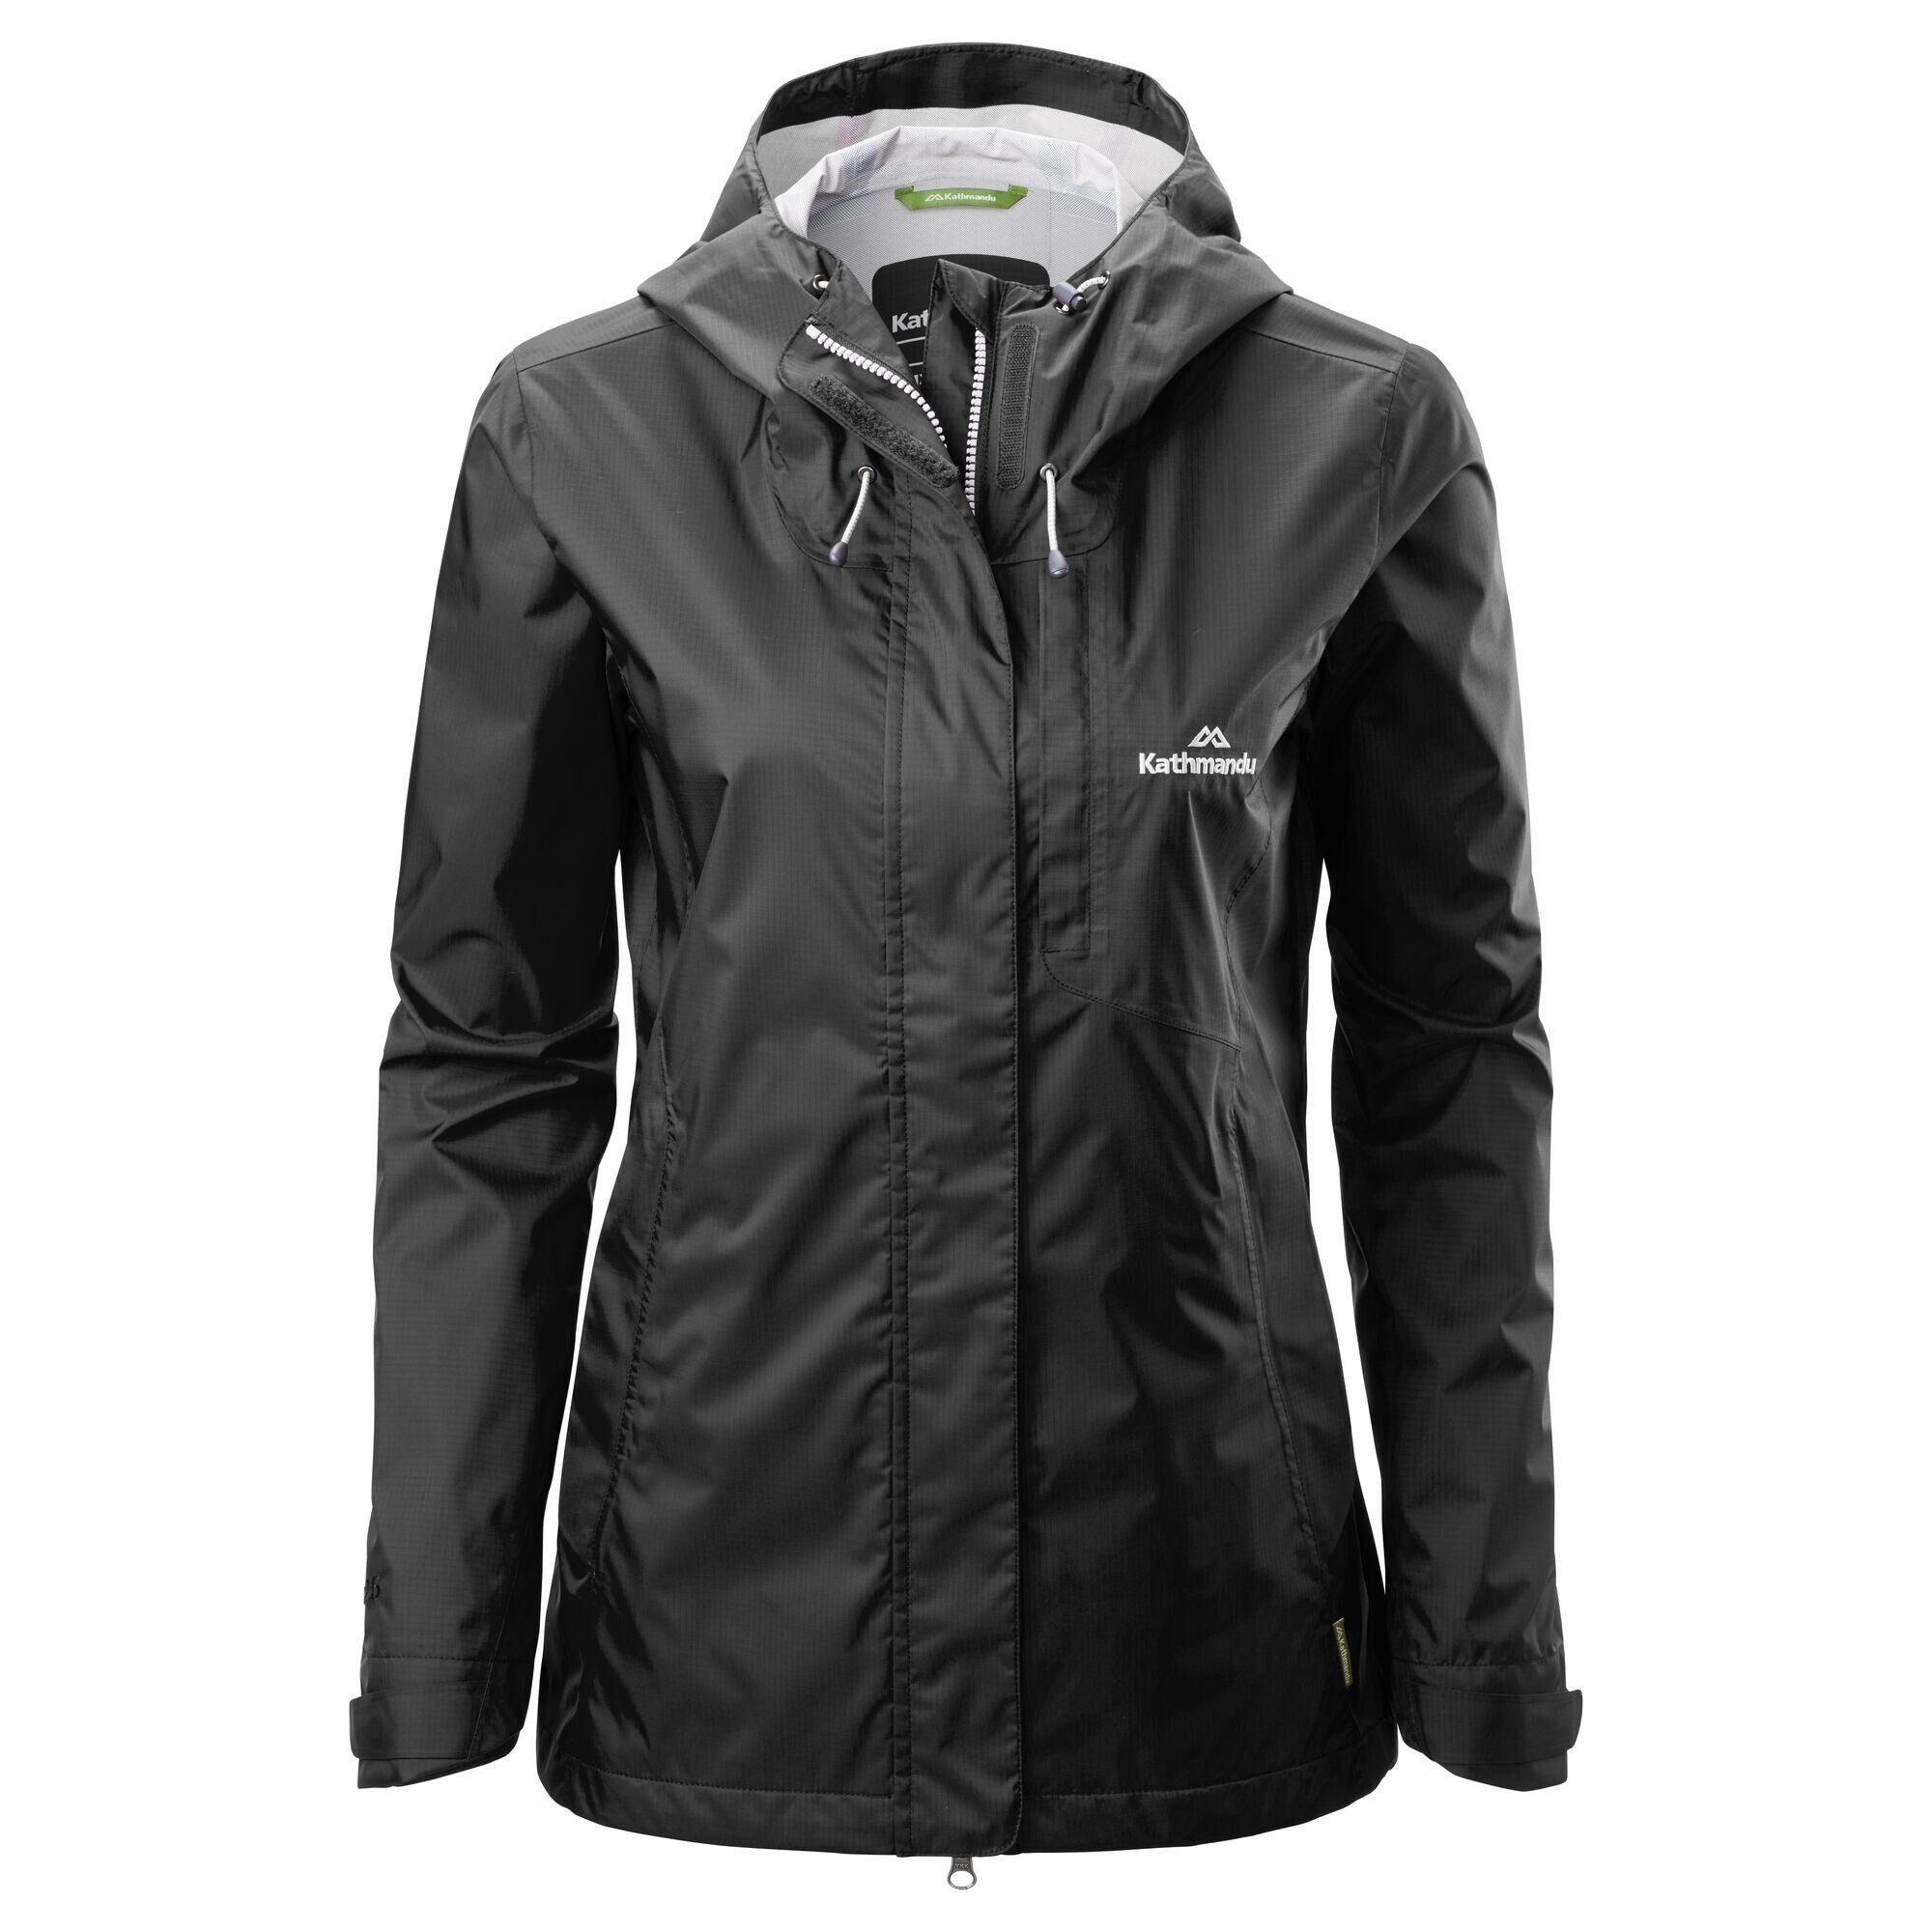 Kathmandu Trailhead Women's Rain Jacket  - Black - Size: US 8